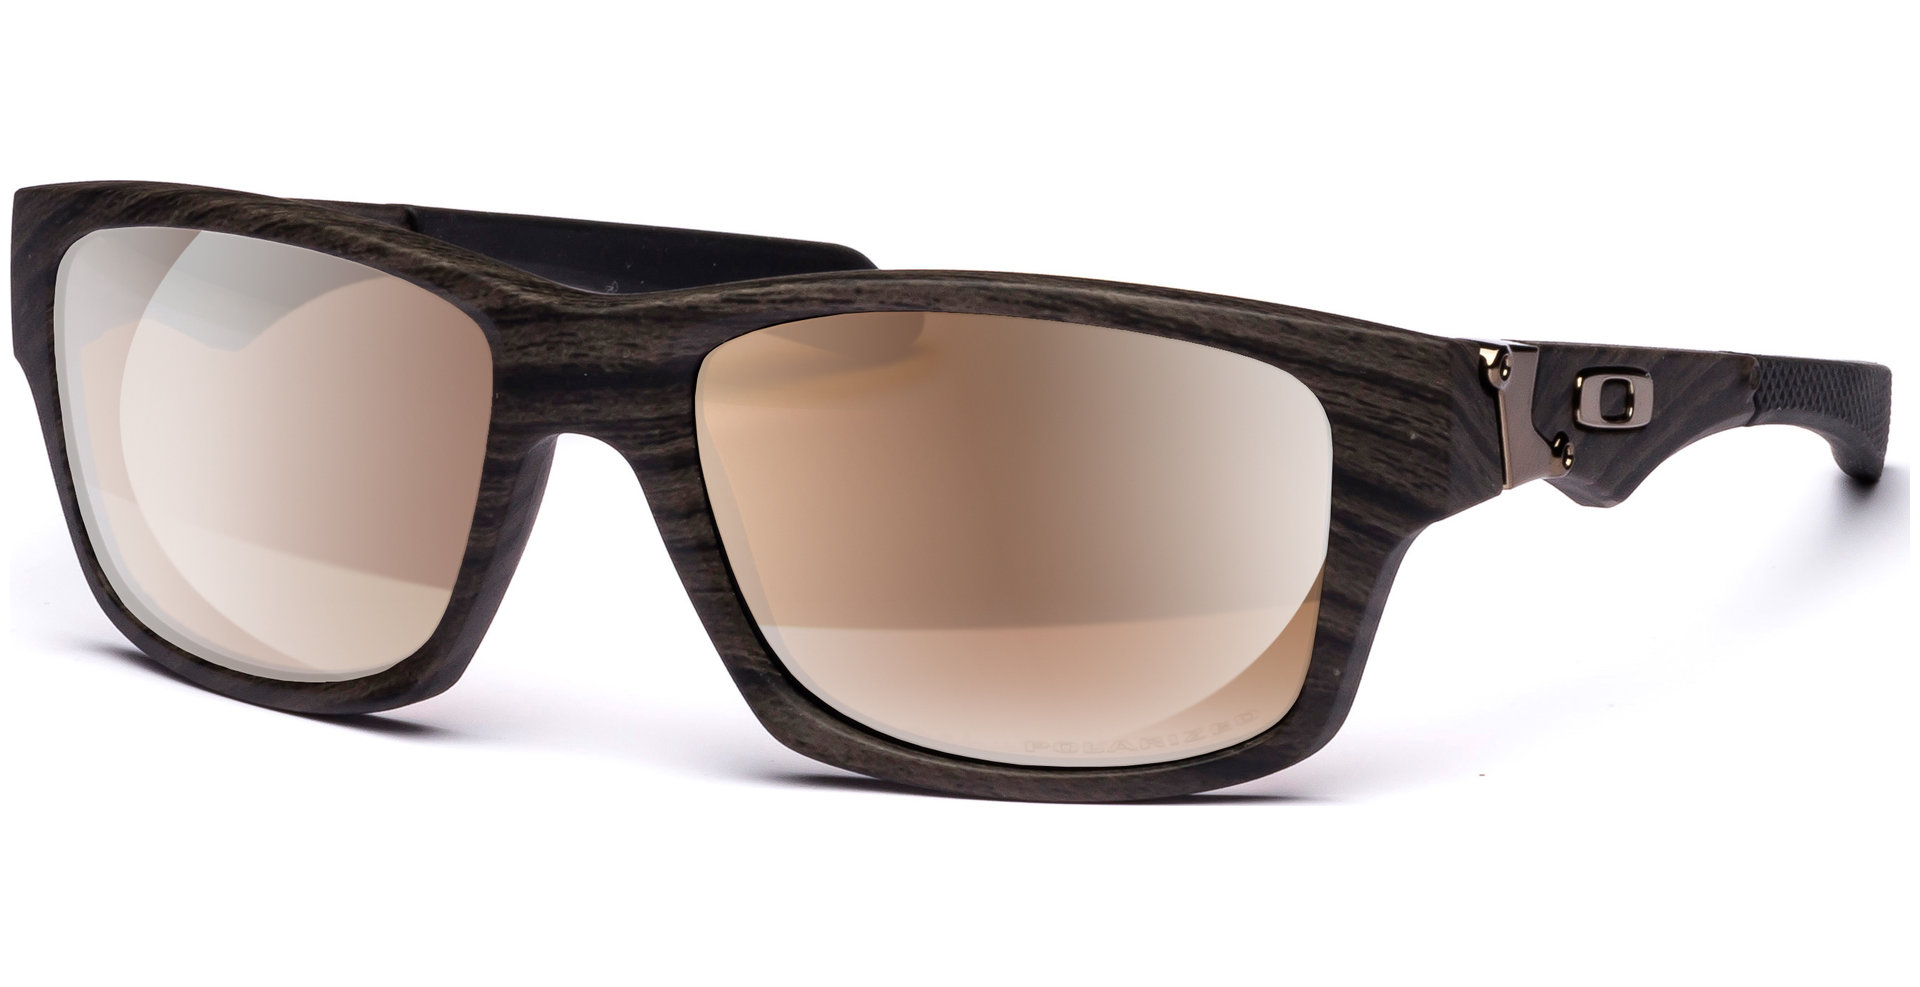 2366daa565 Oakley Jupiter Squared Wood Grain L Tungsten Iridium Polarized ...